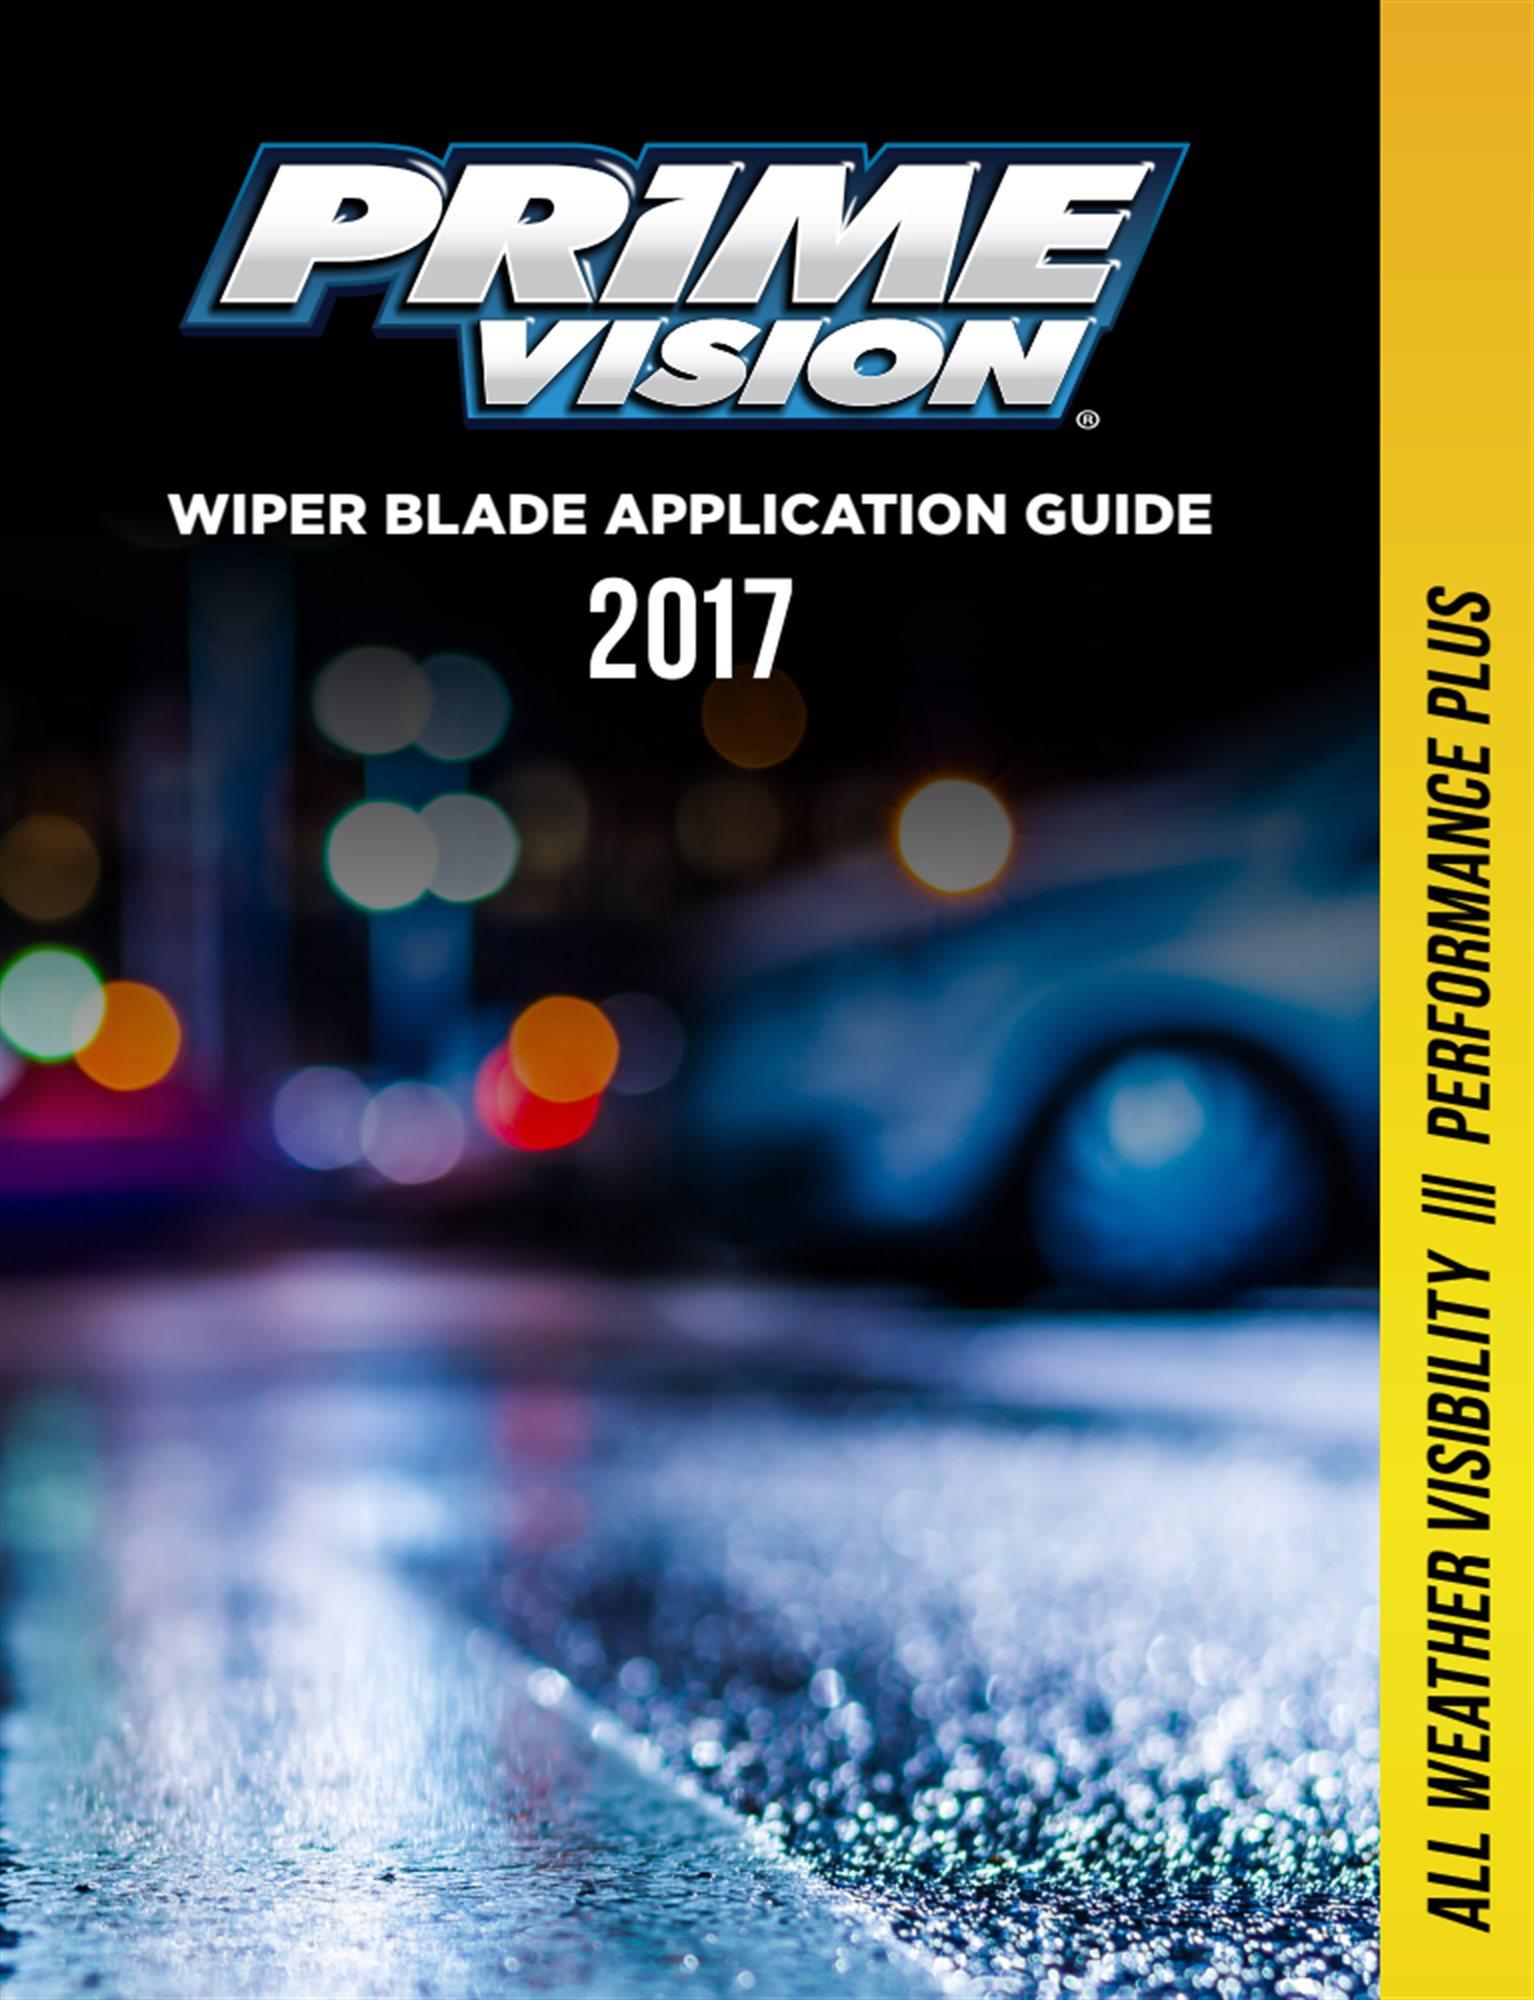 Prime Vision Wiper Blade App Guide 2017 web